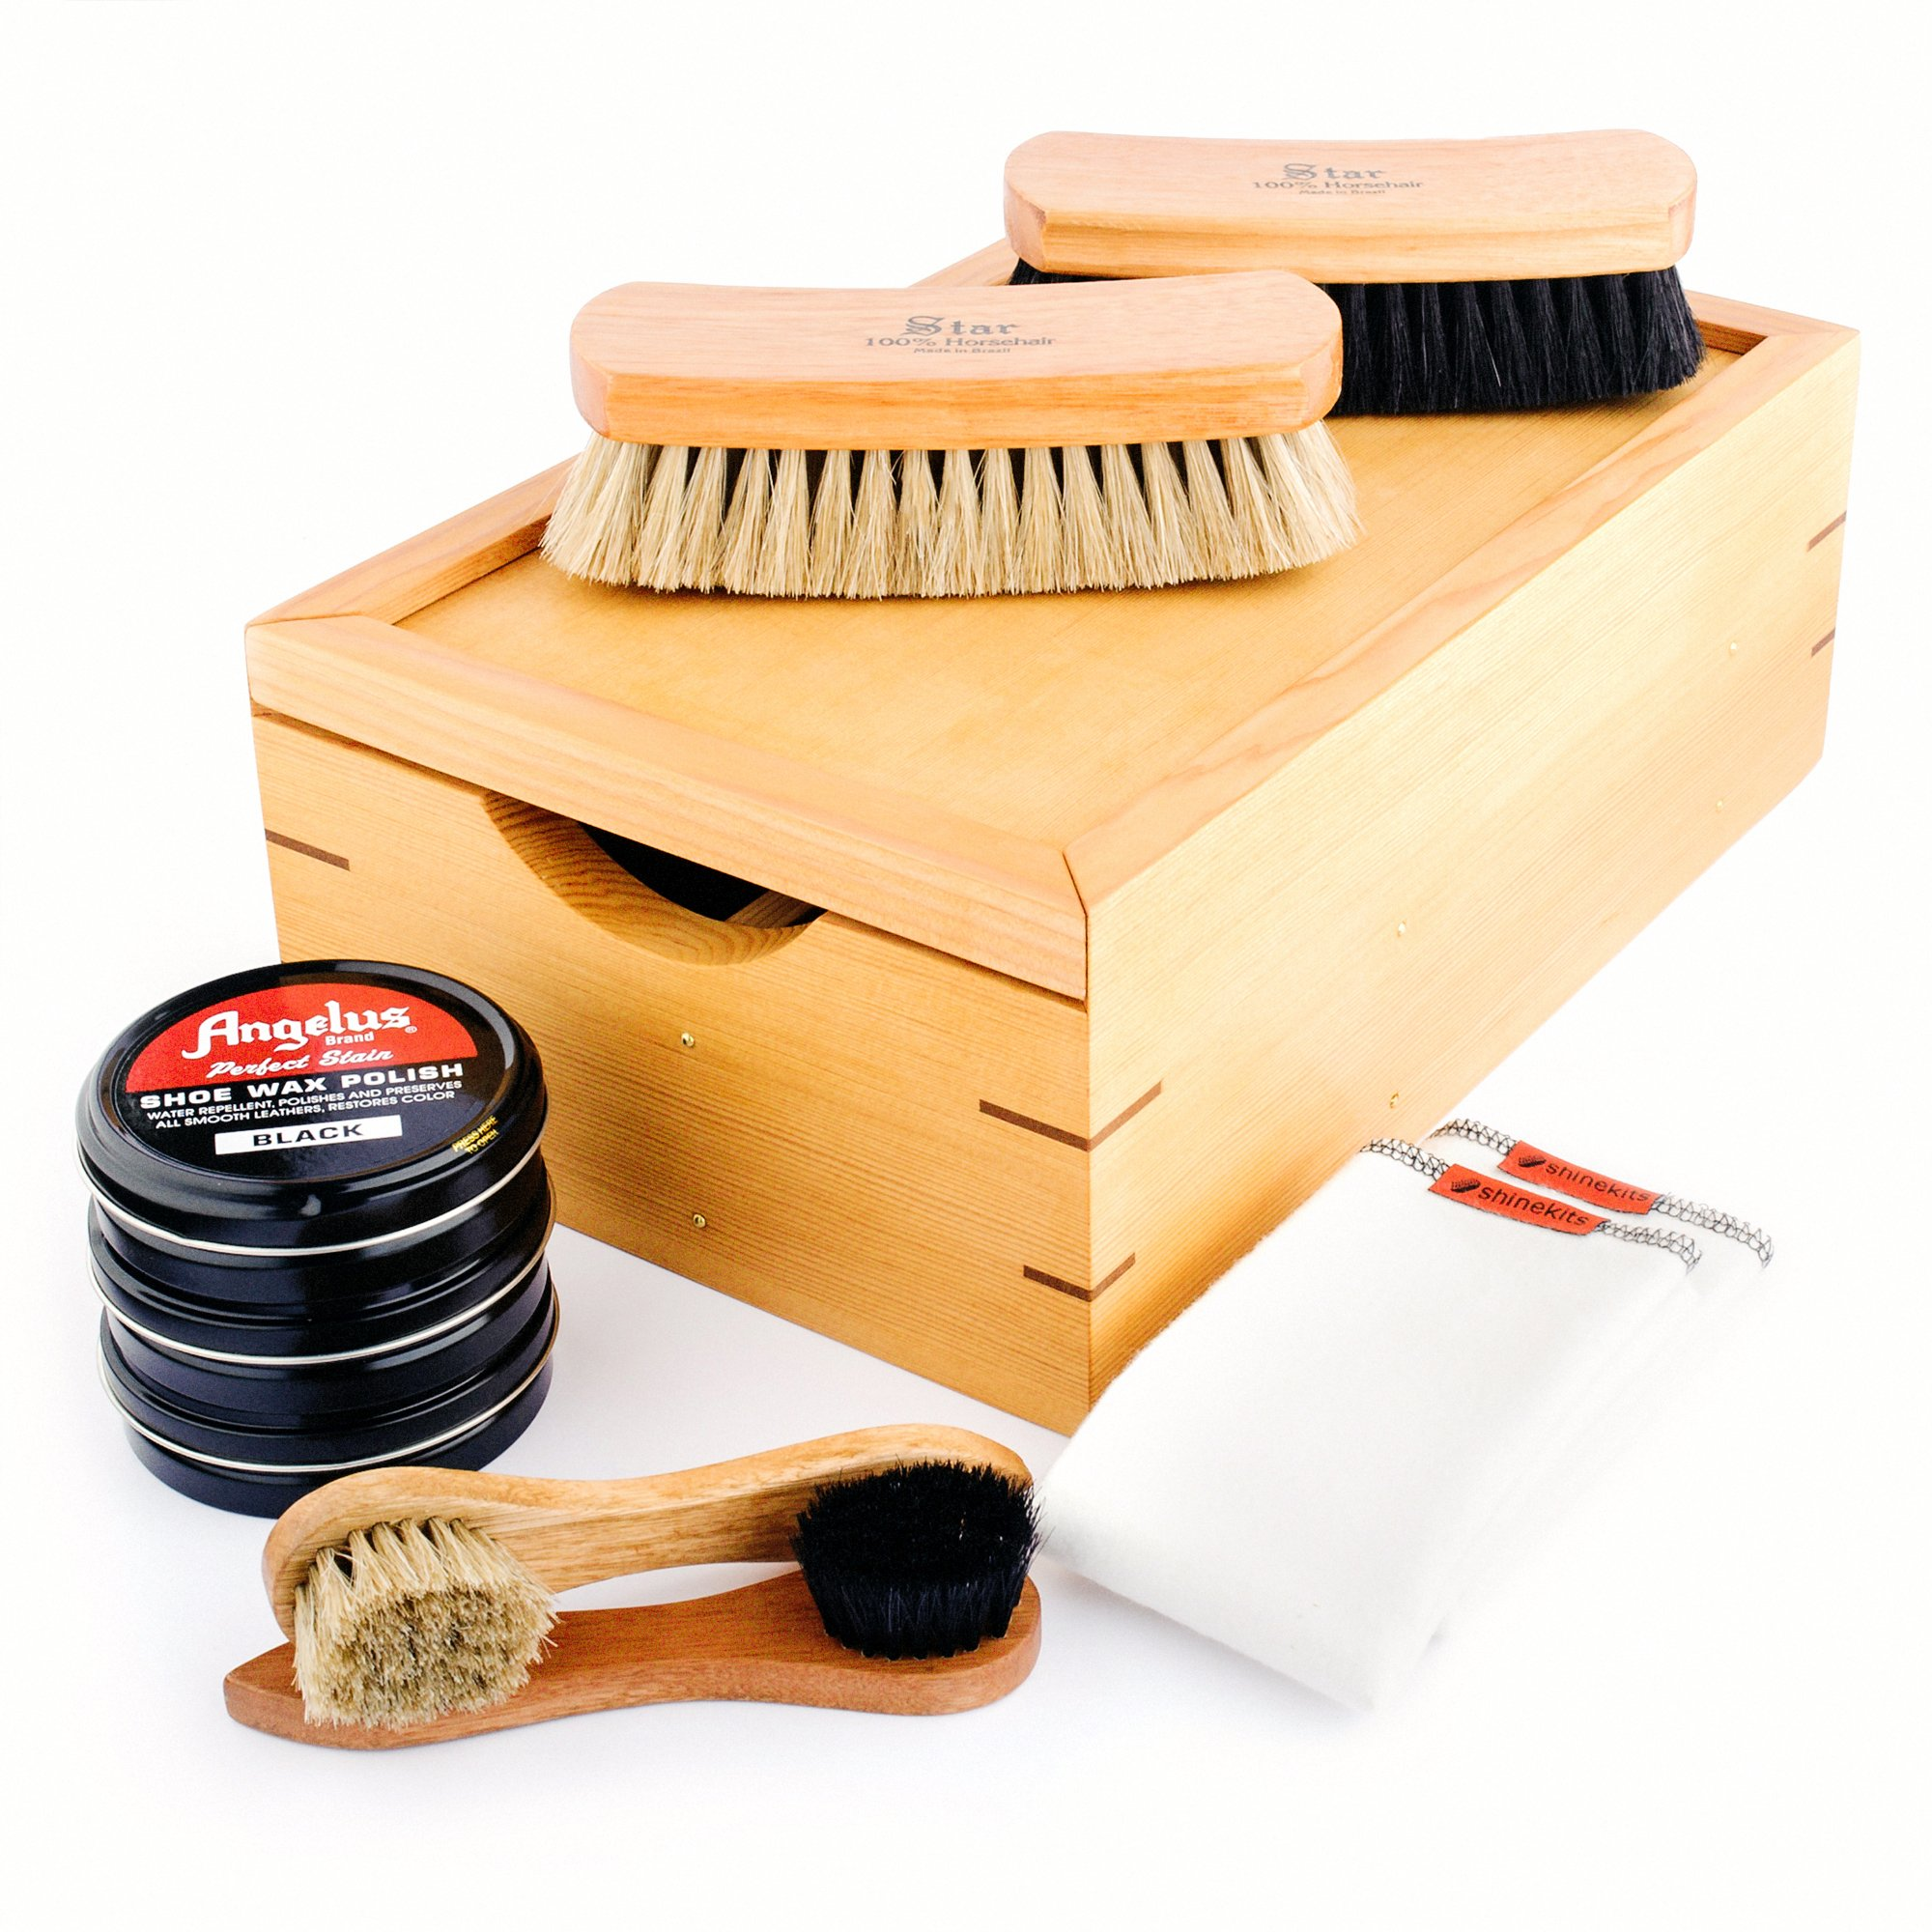 Shinekits Ultimate Shoe Shine Kit in Honey Finish by Shinekits (Image #1)